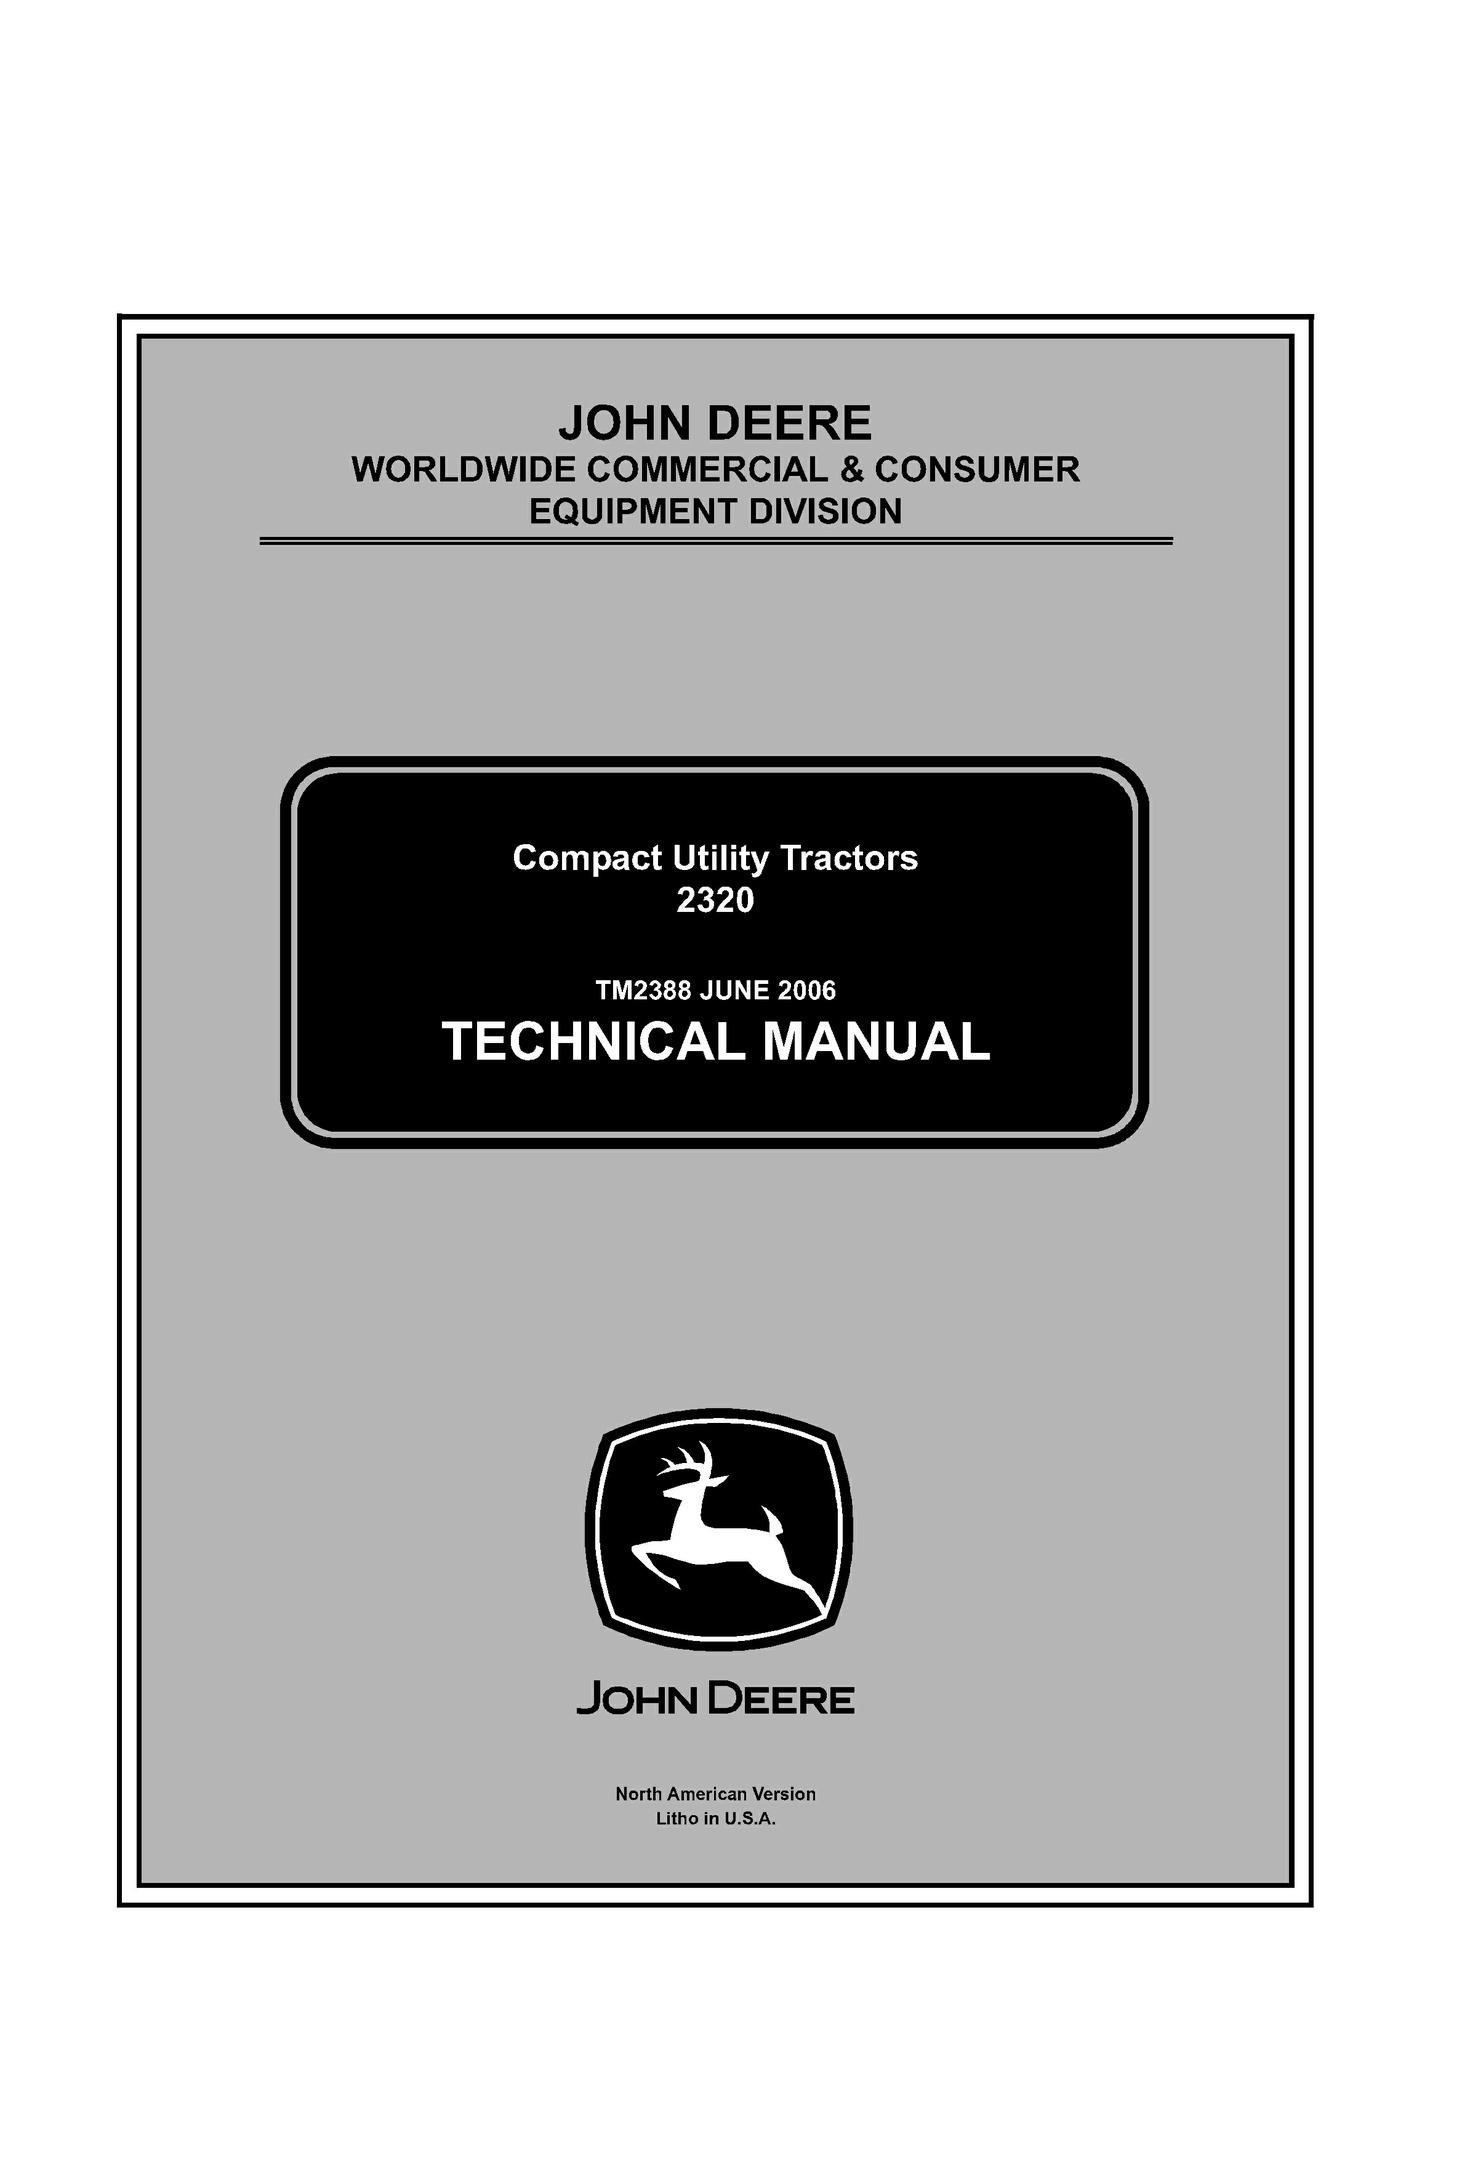 John Deere Mower Manuals Free Download Trusted Wiring Diagrams 8960 Diagram 2320 Compact Utility Tractor Servi Rh Sellfy Com Manual